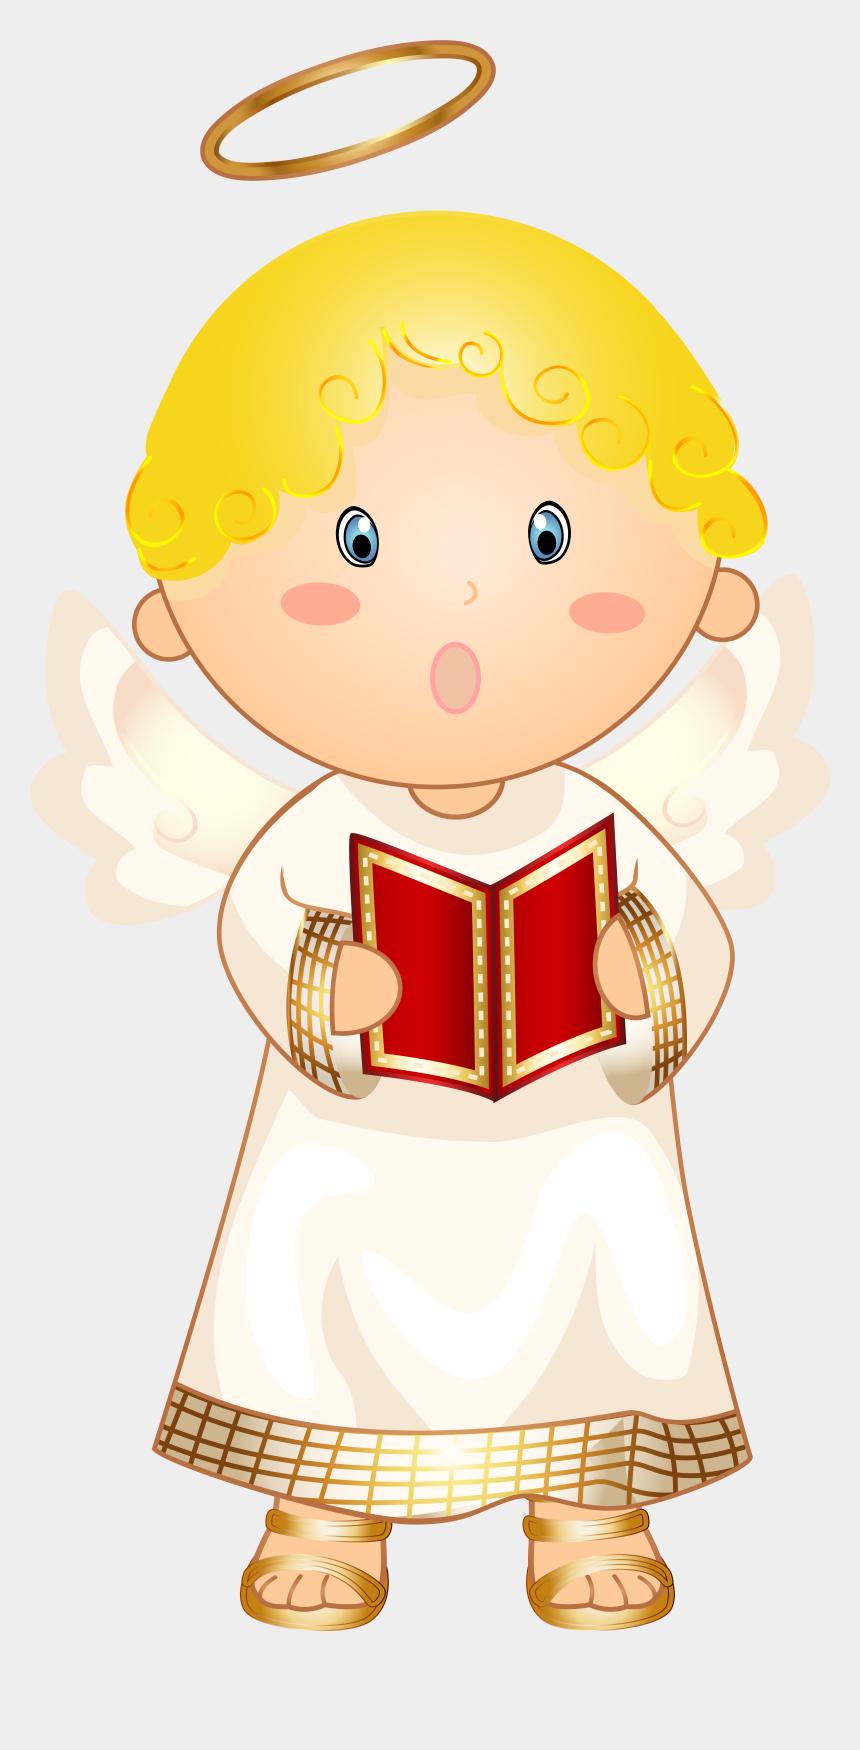 angels clipart, Cartoons - Little Angel Caroler Transparent Png Clip Art Image - Little Angel Transparent